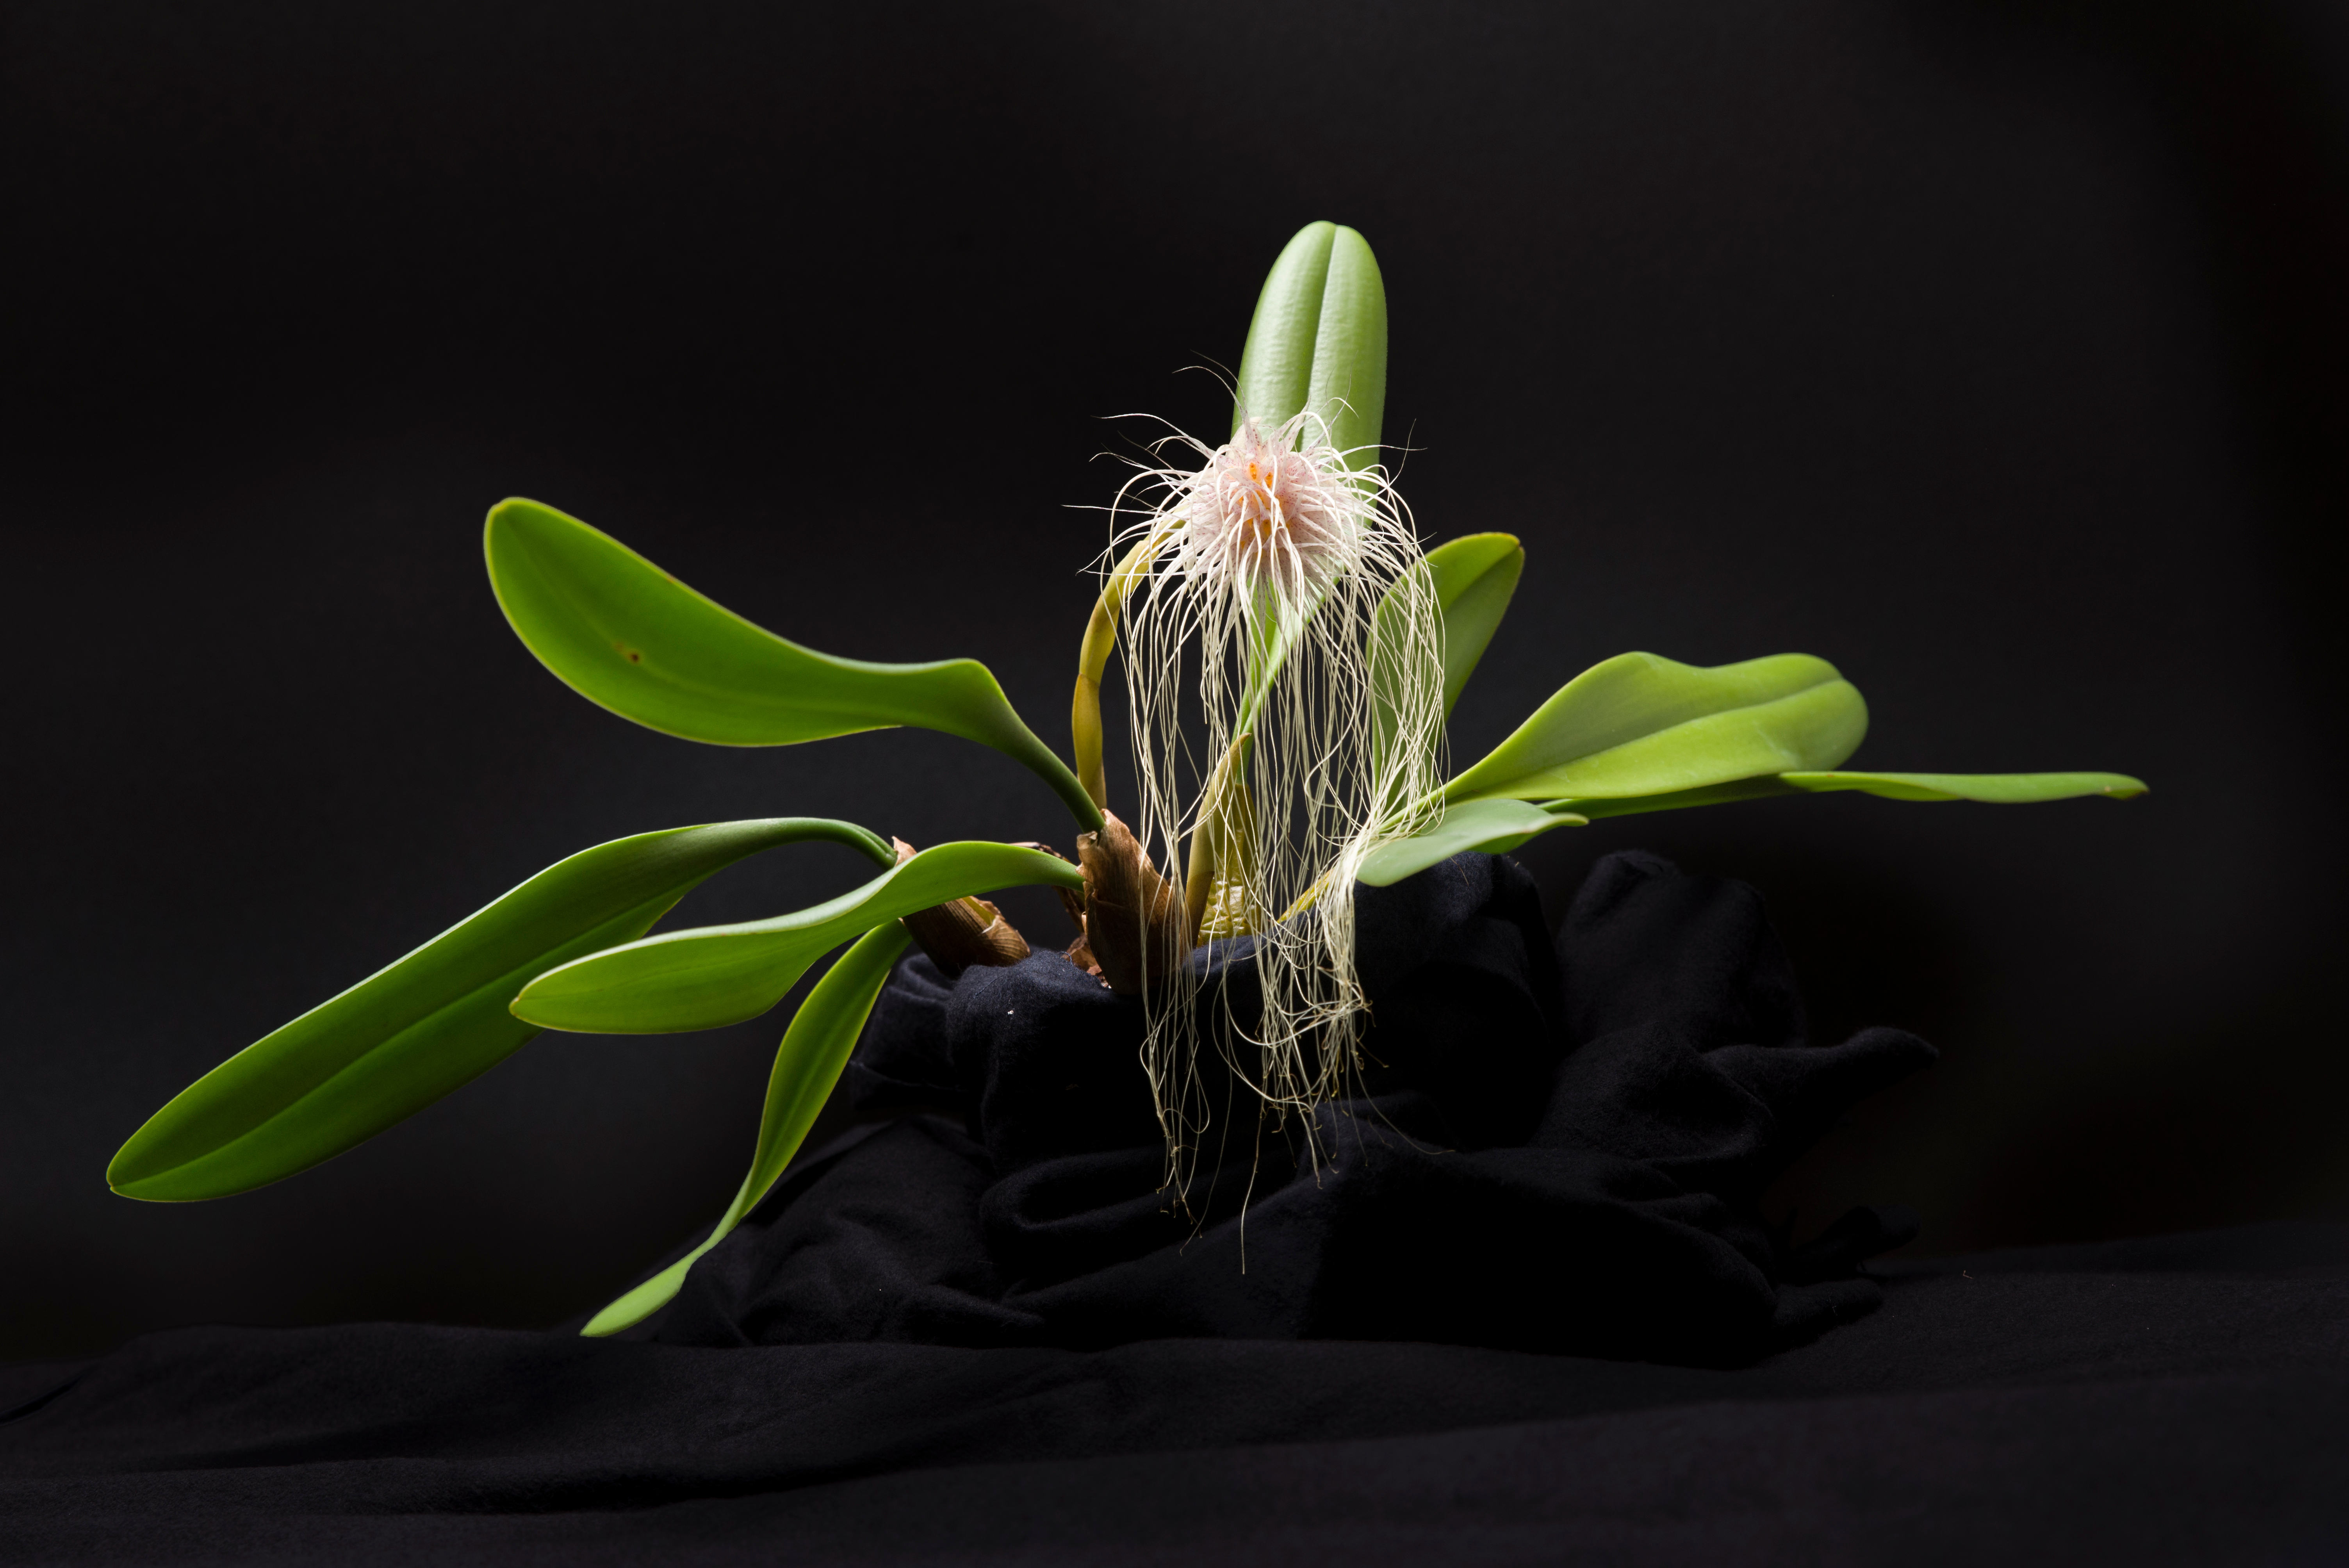 Orchid Desktop Wallpaper Chicago Botanic Garden